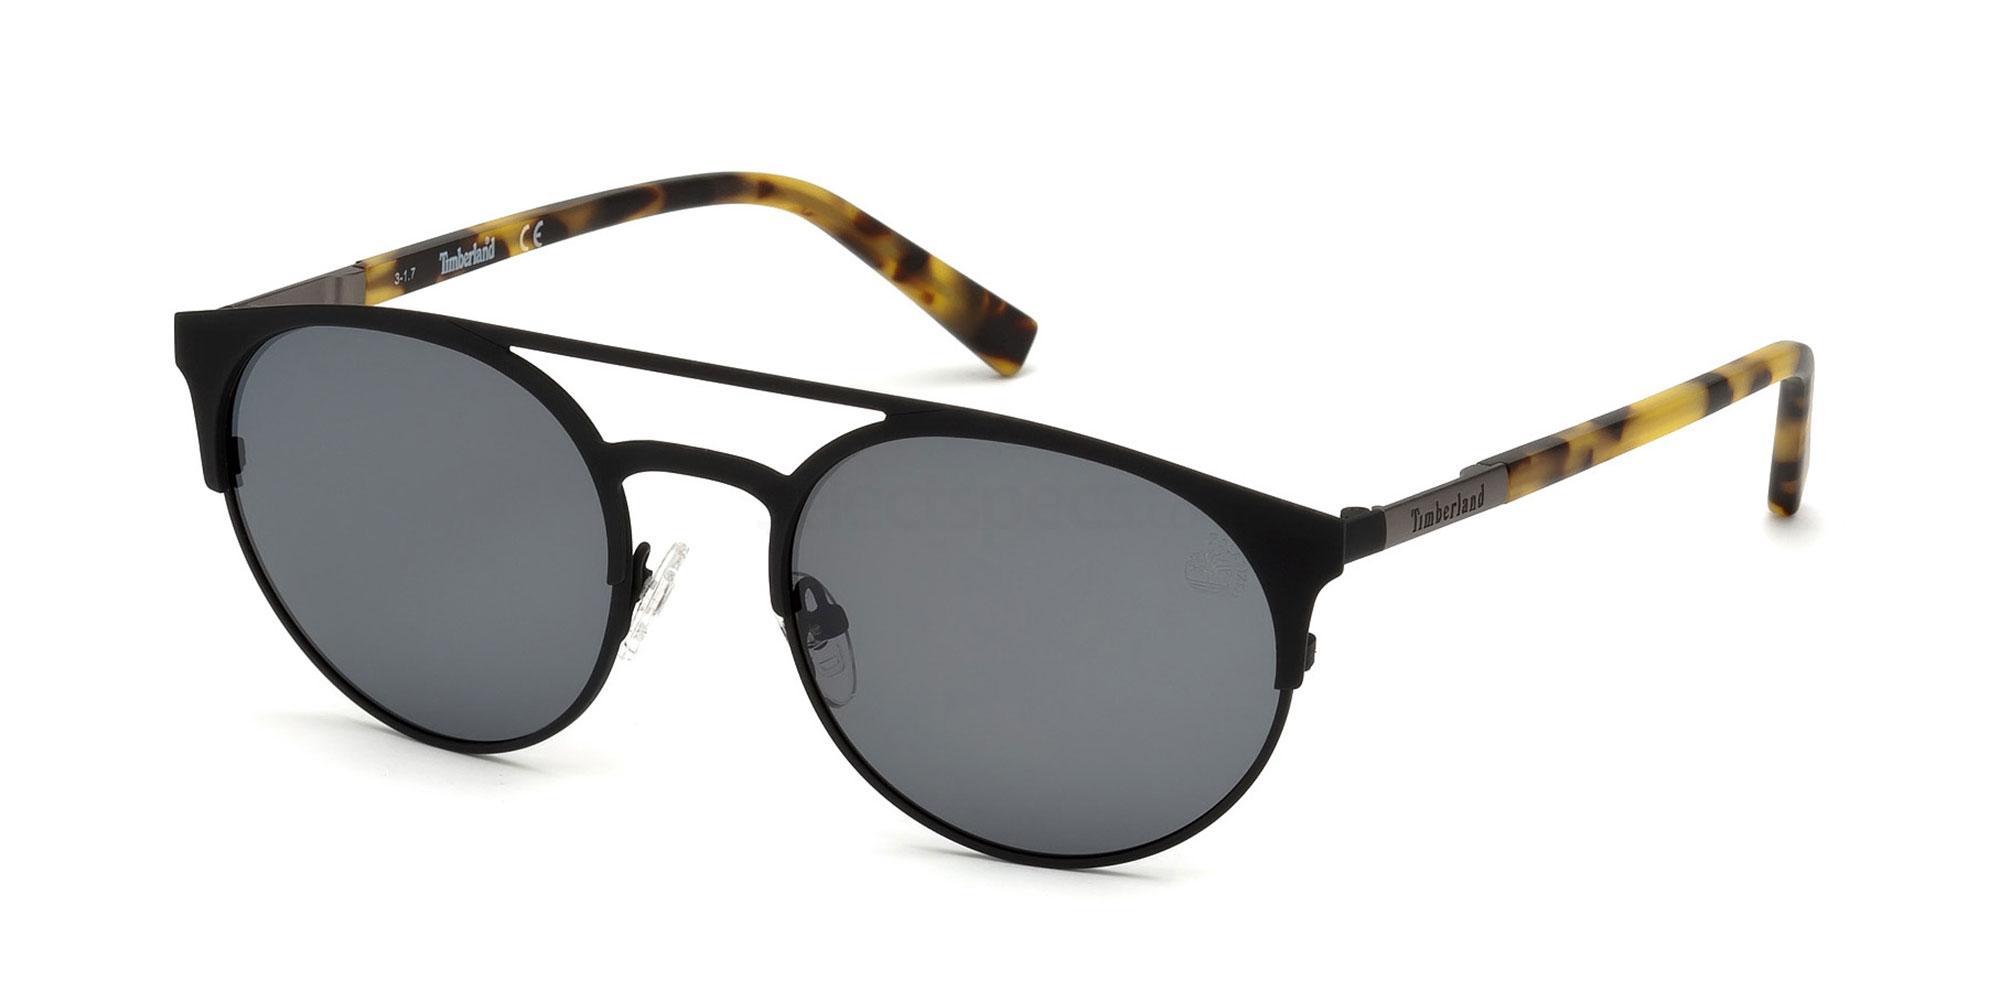 02D TB9120 Sunglasses, Timberland